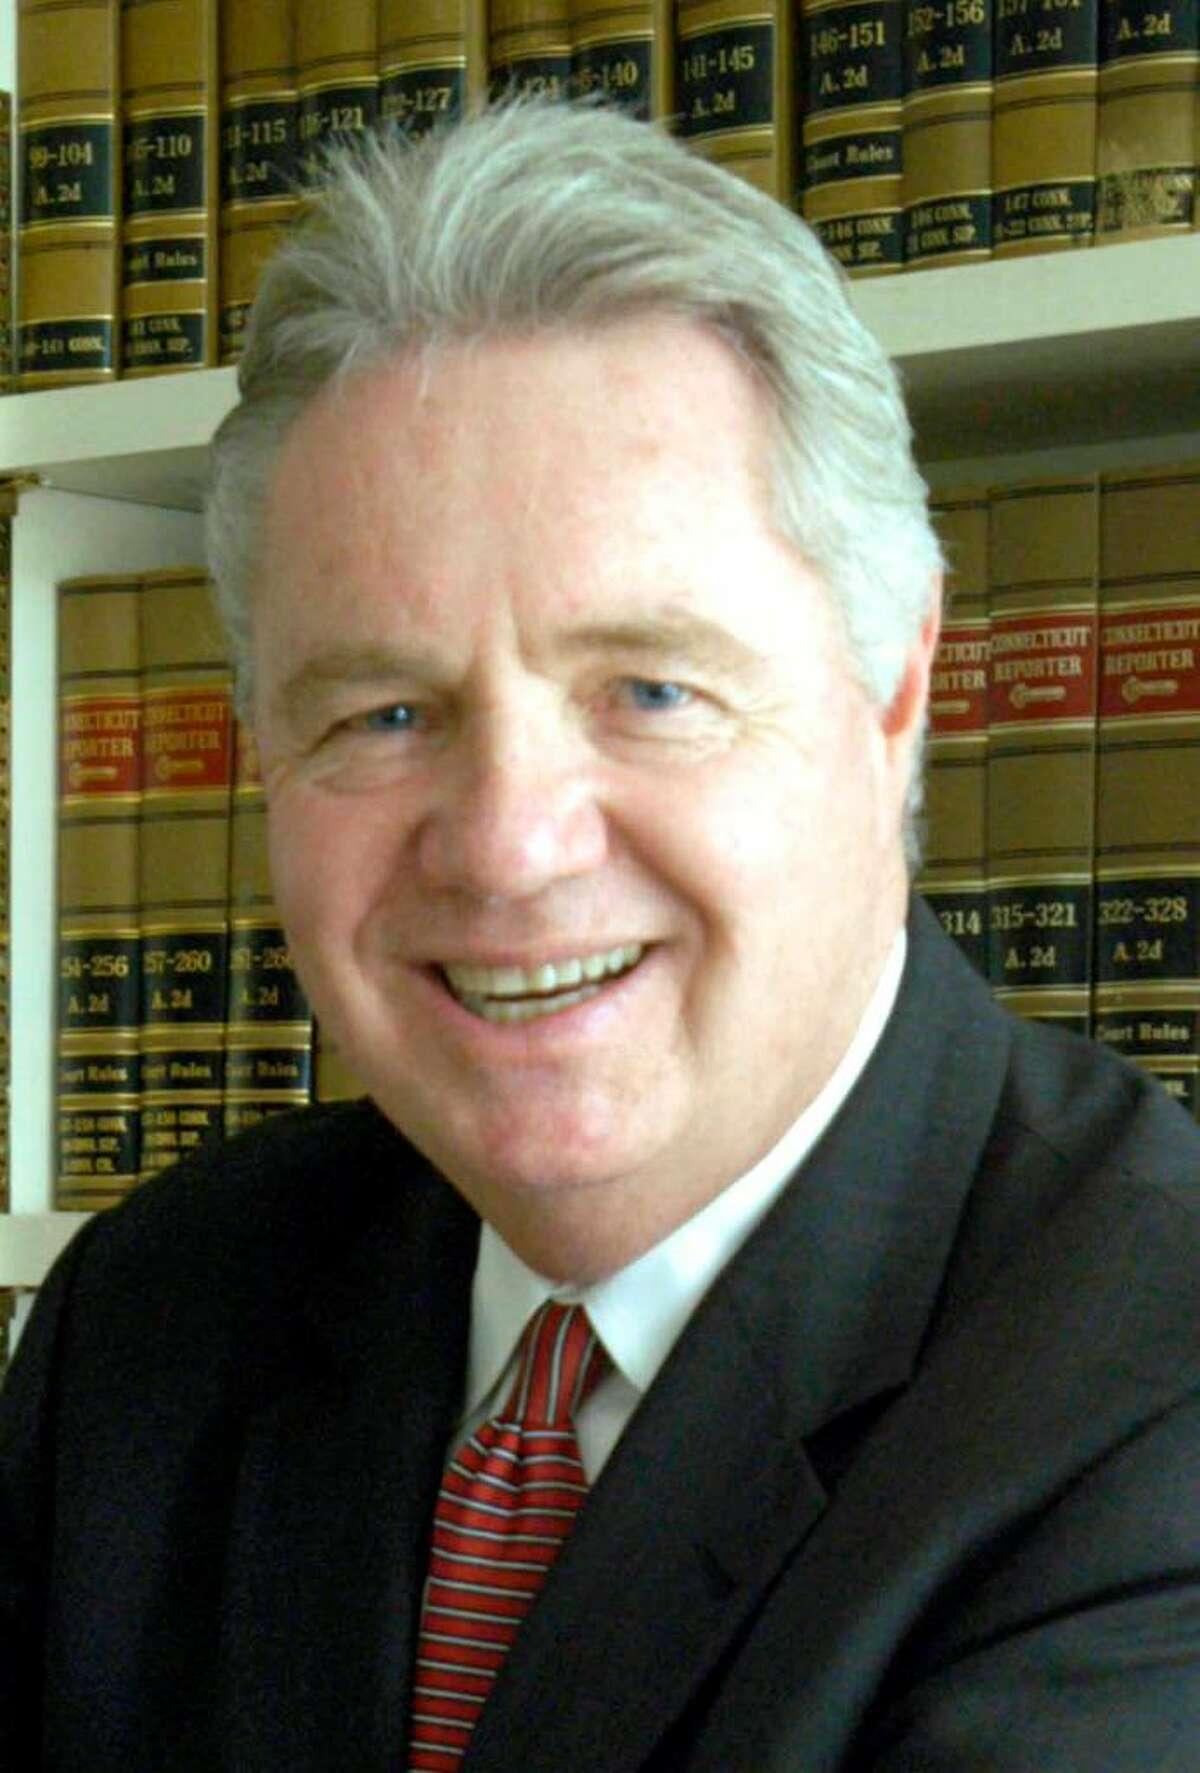 Ridgefield Probate Judge Joe Egan